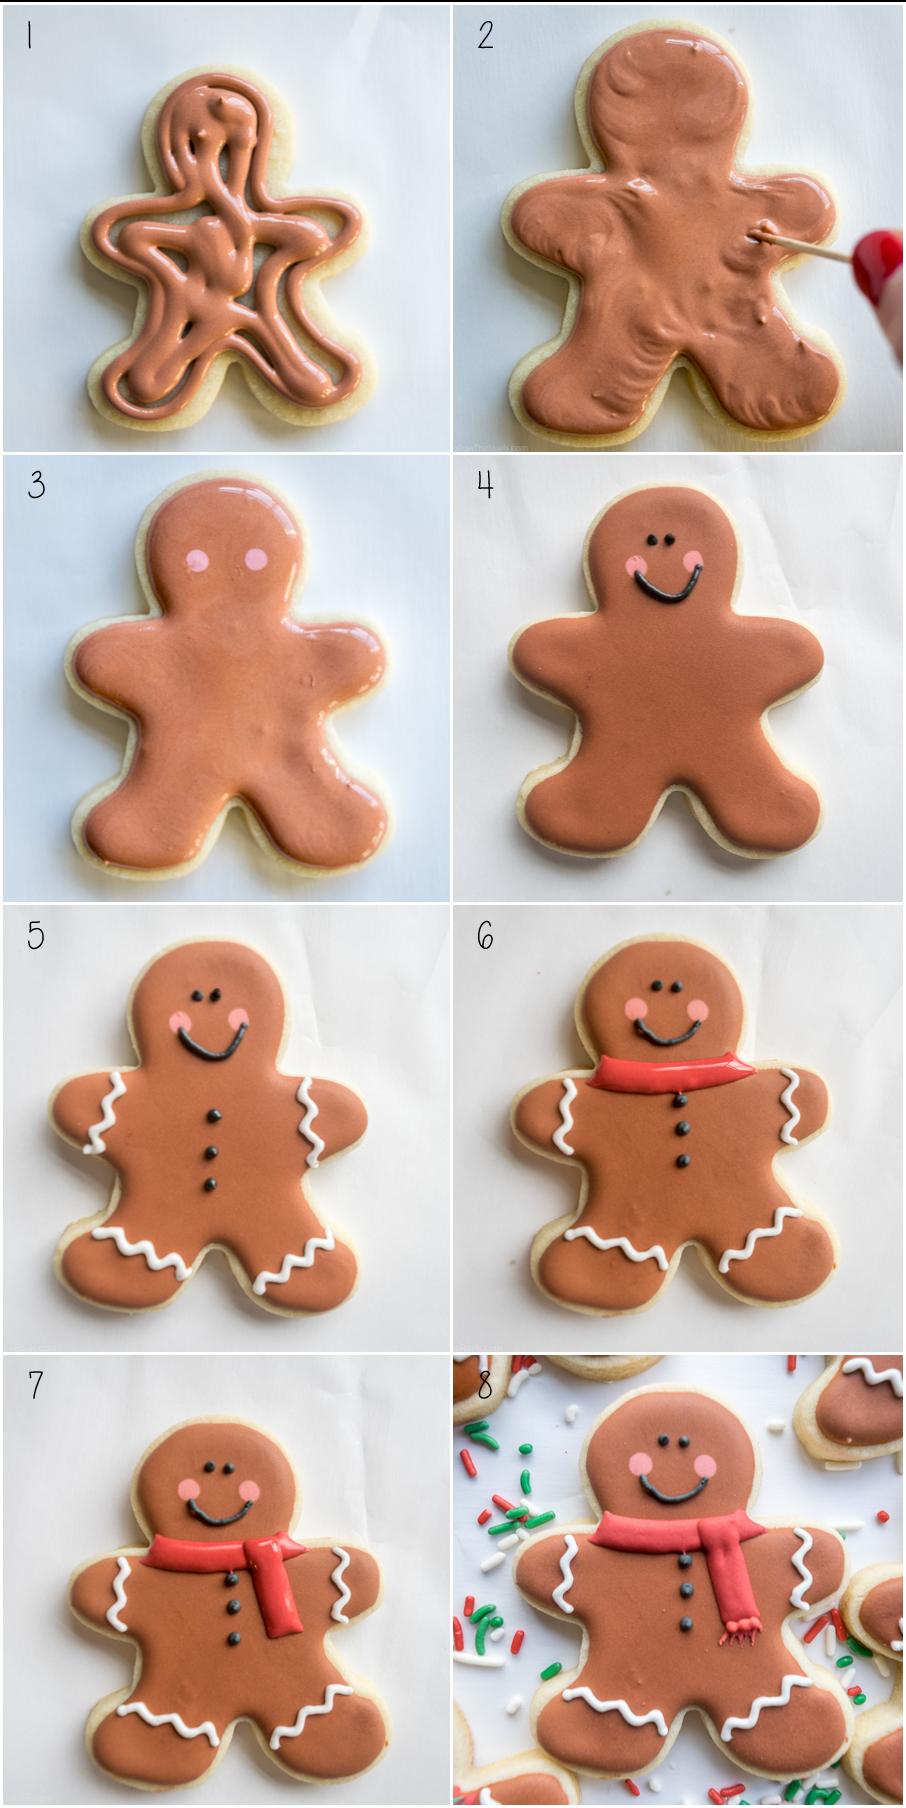 Step By Step To Making Gingerbread Men Sugar Cookies Food Recipes